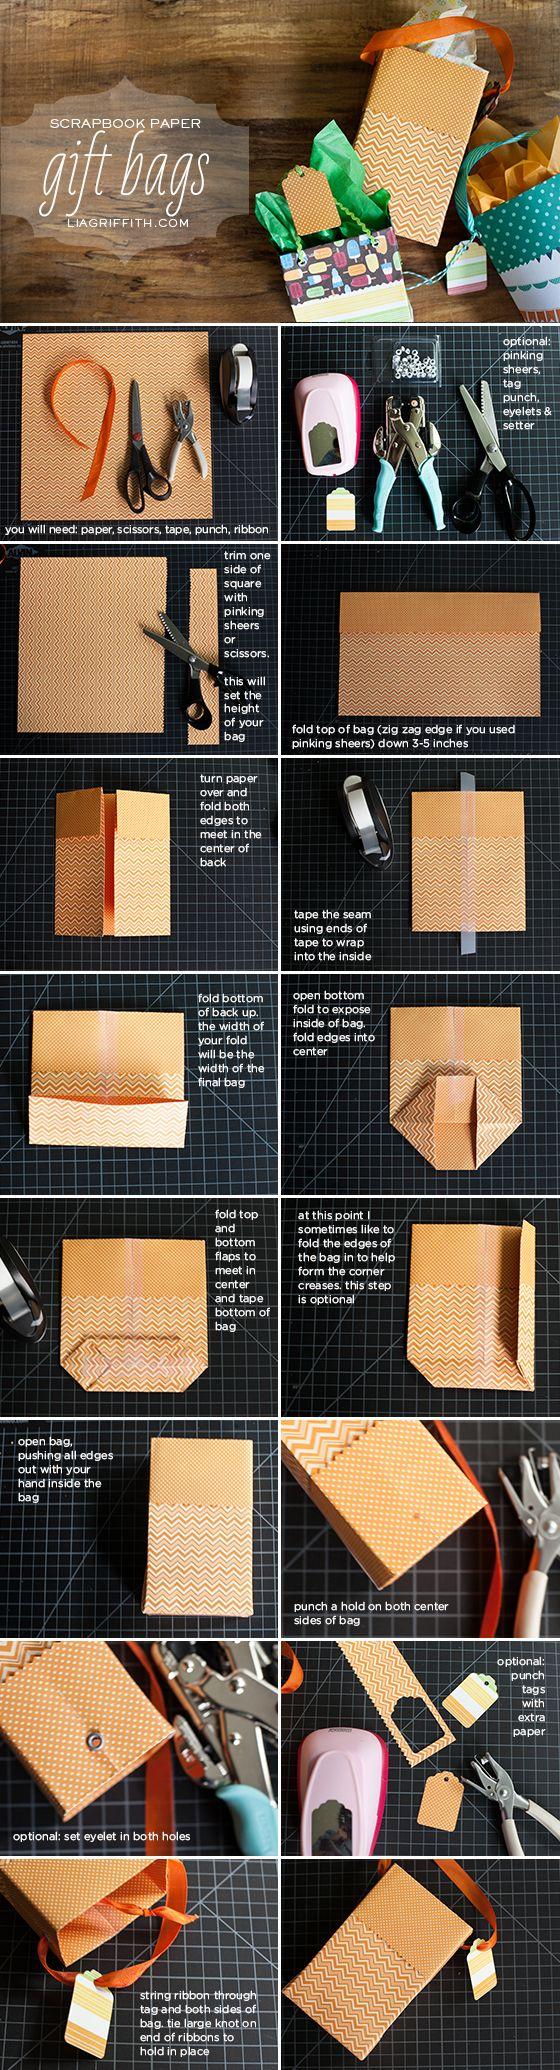 DIY Gift Bags from Scrapbook paper